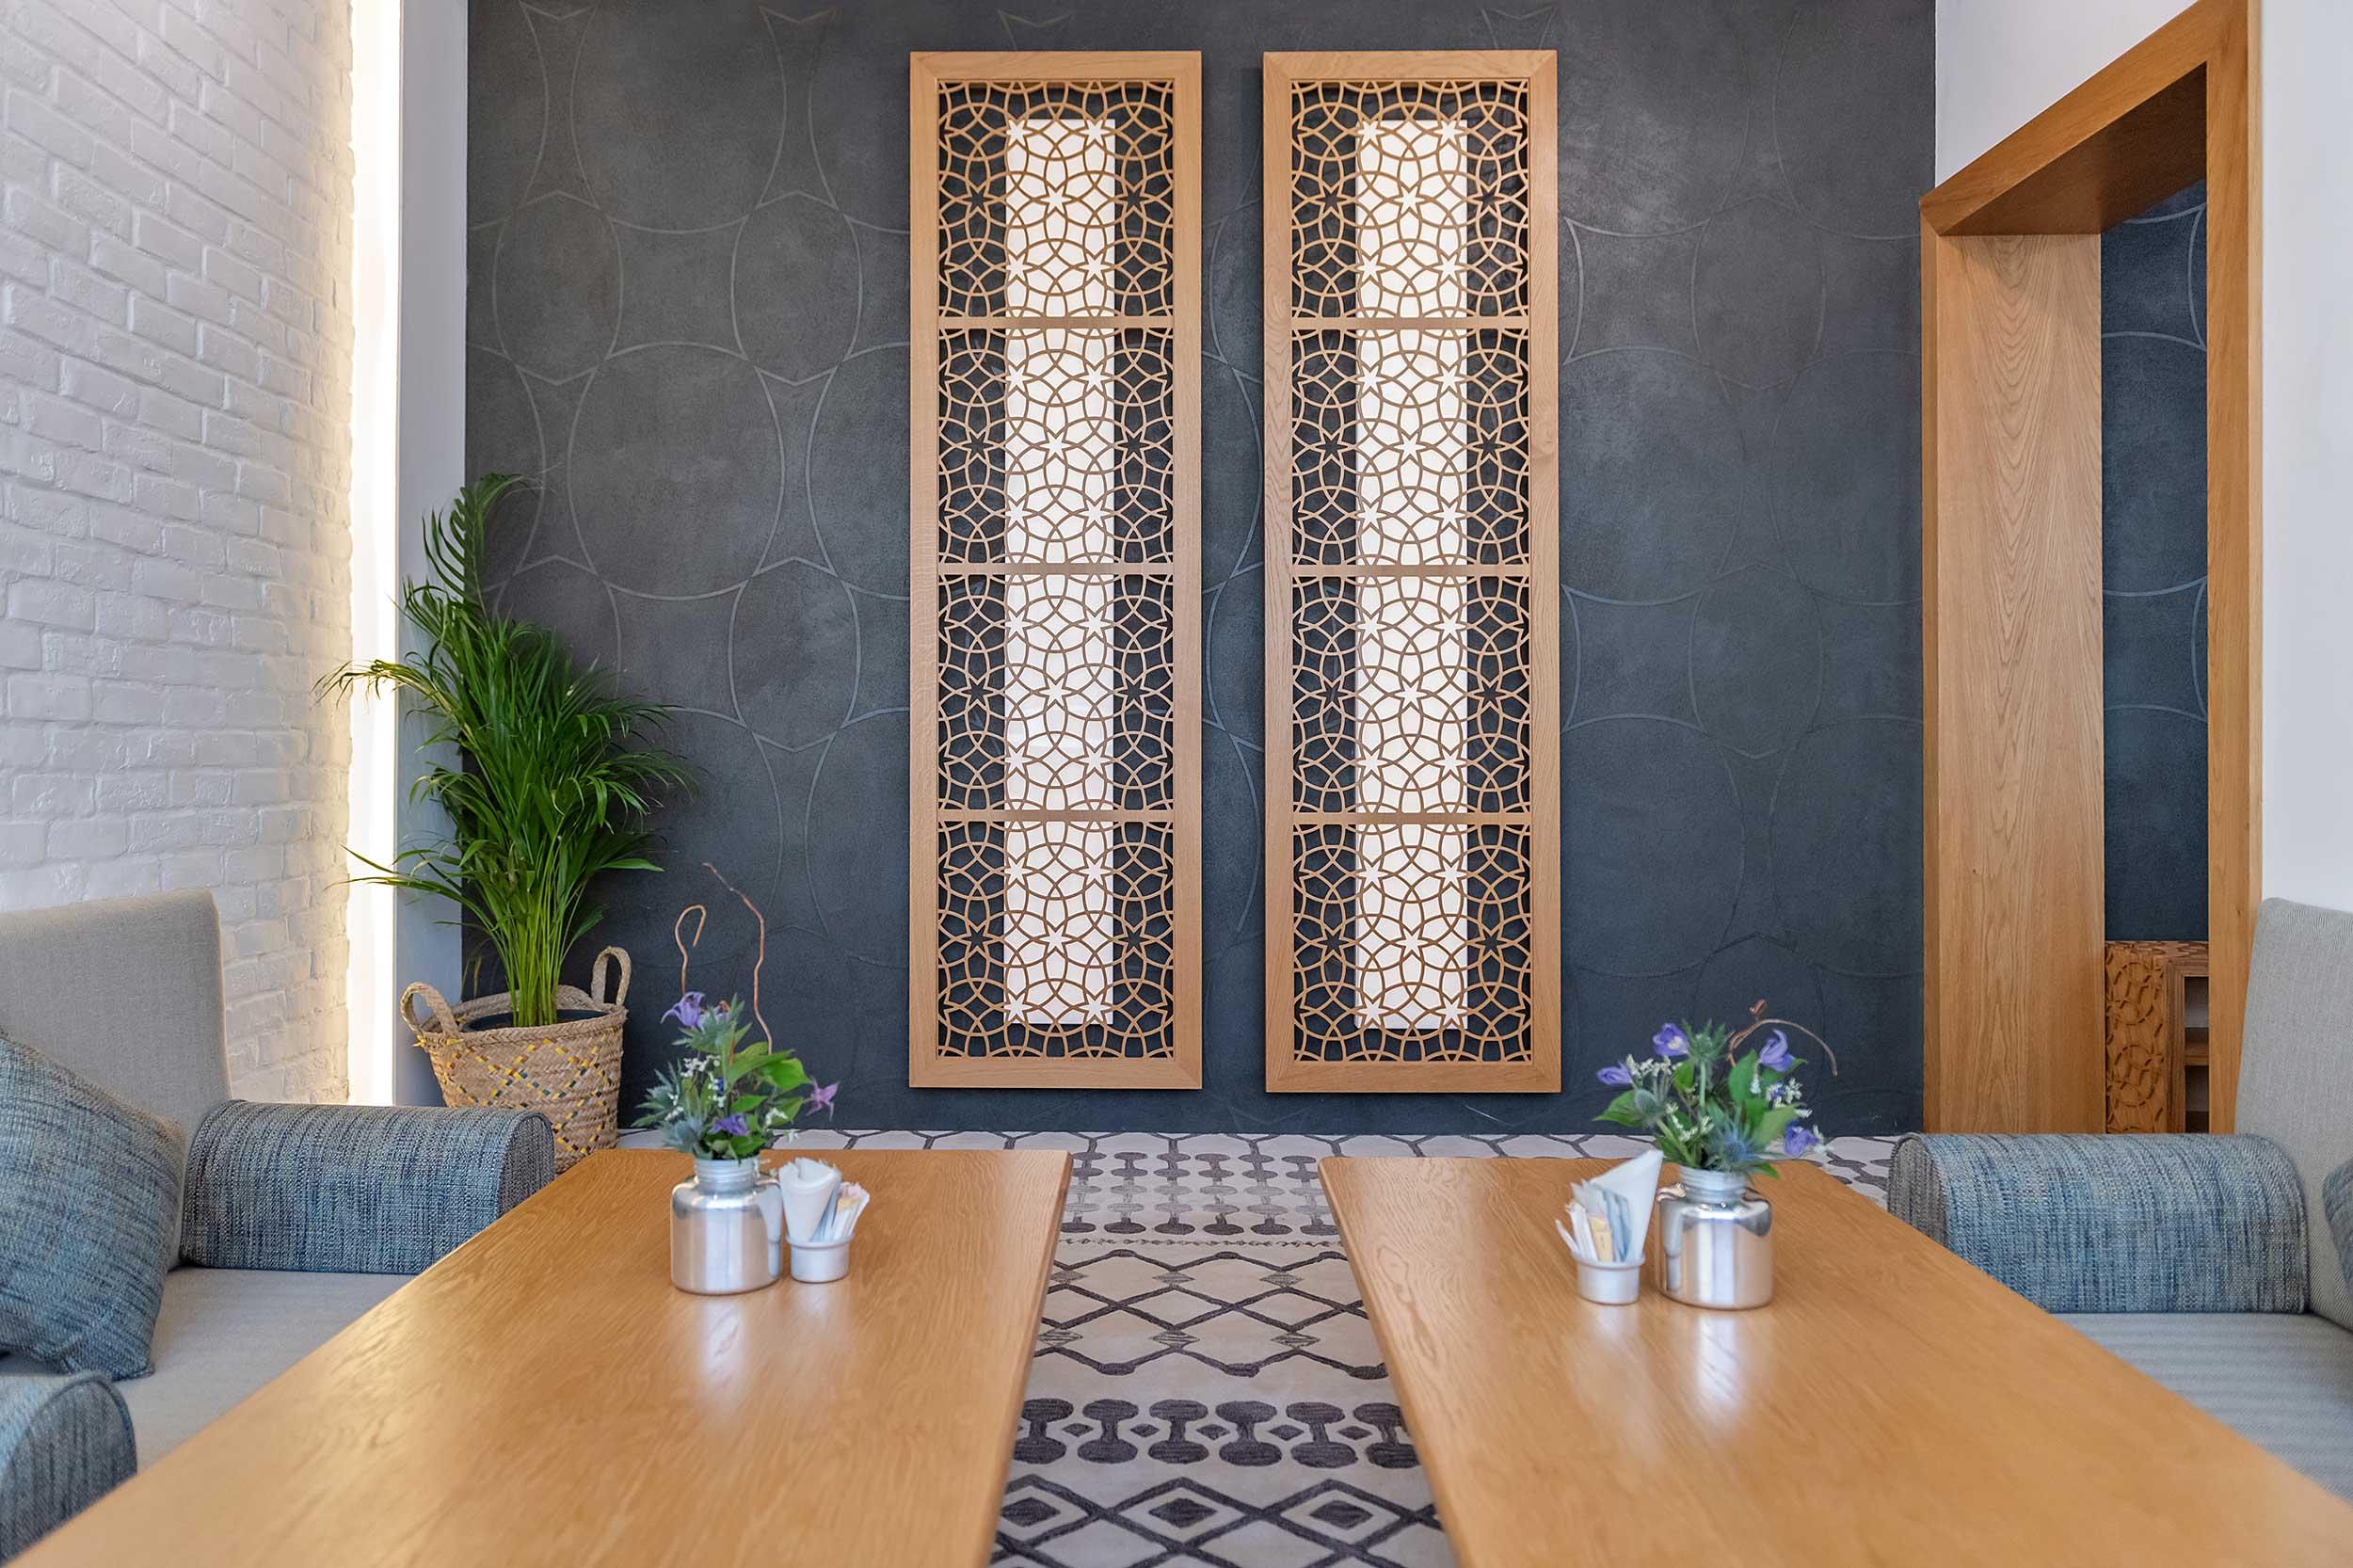 Kraz-BestInterior Design Company in Dubai